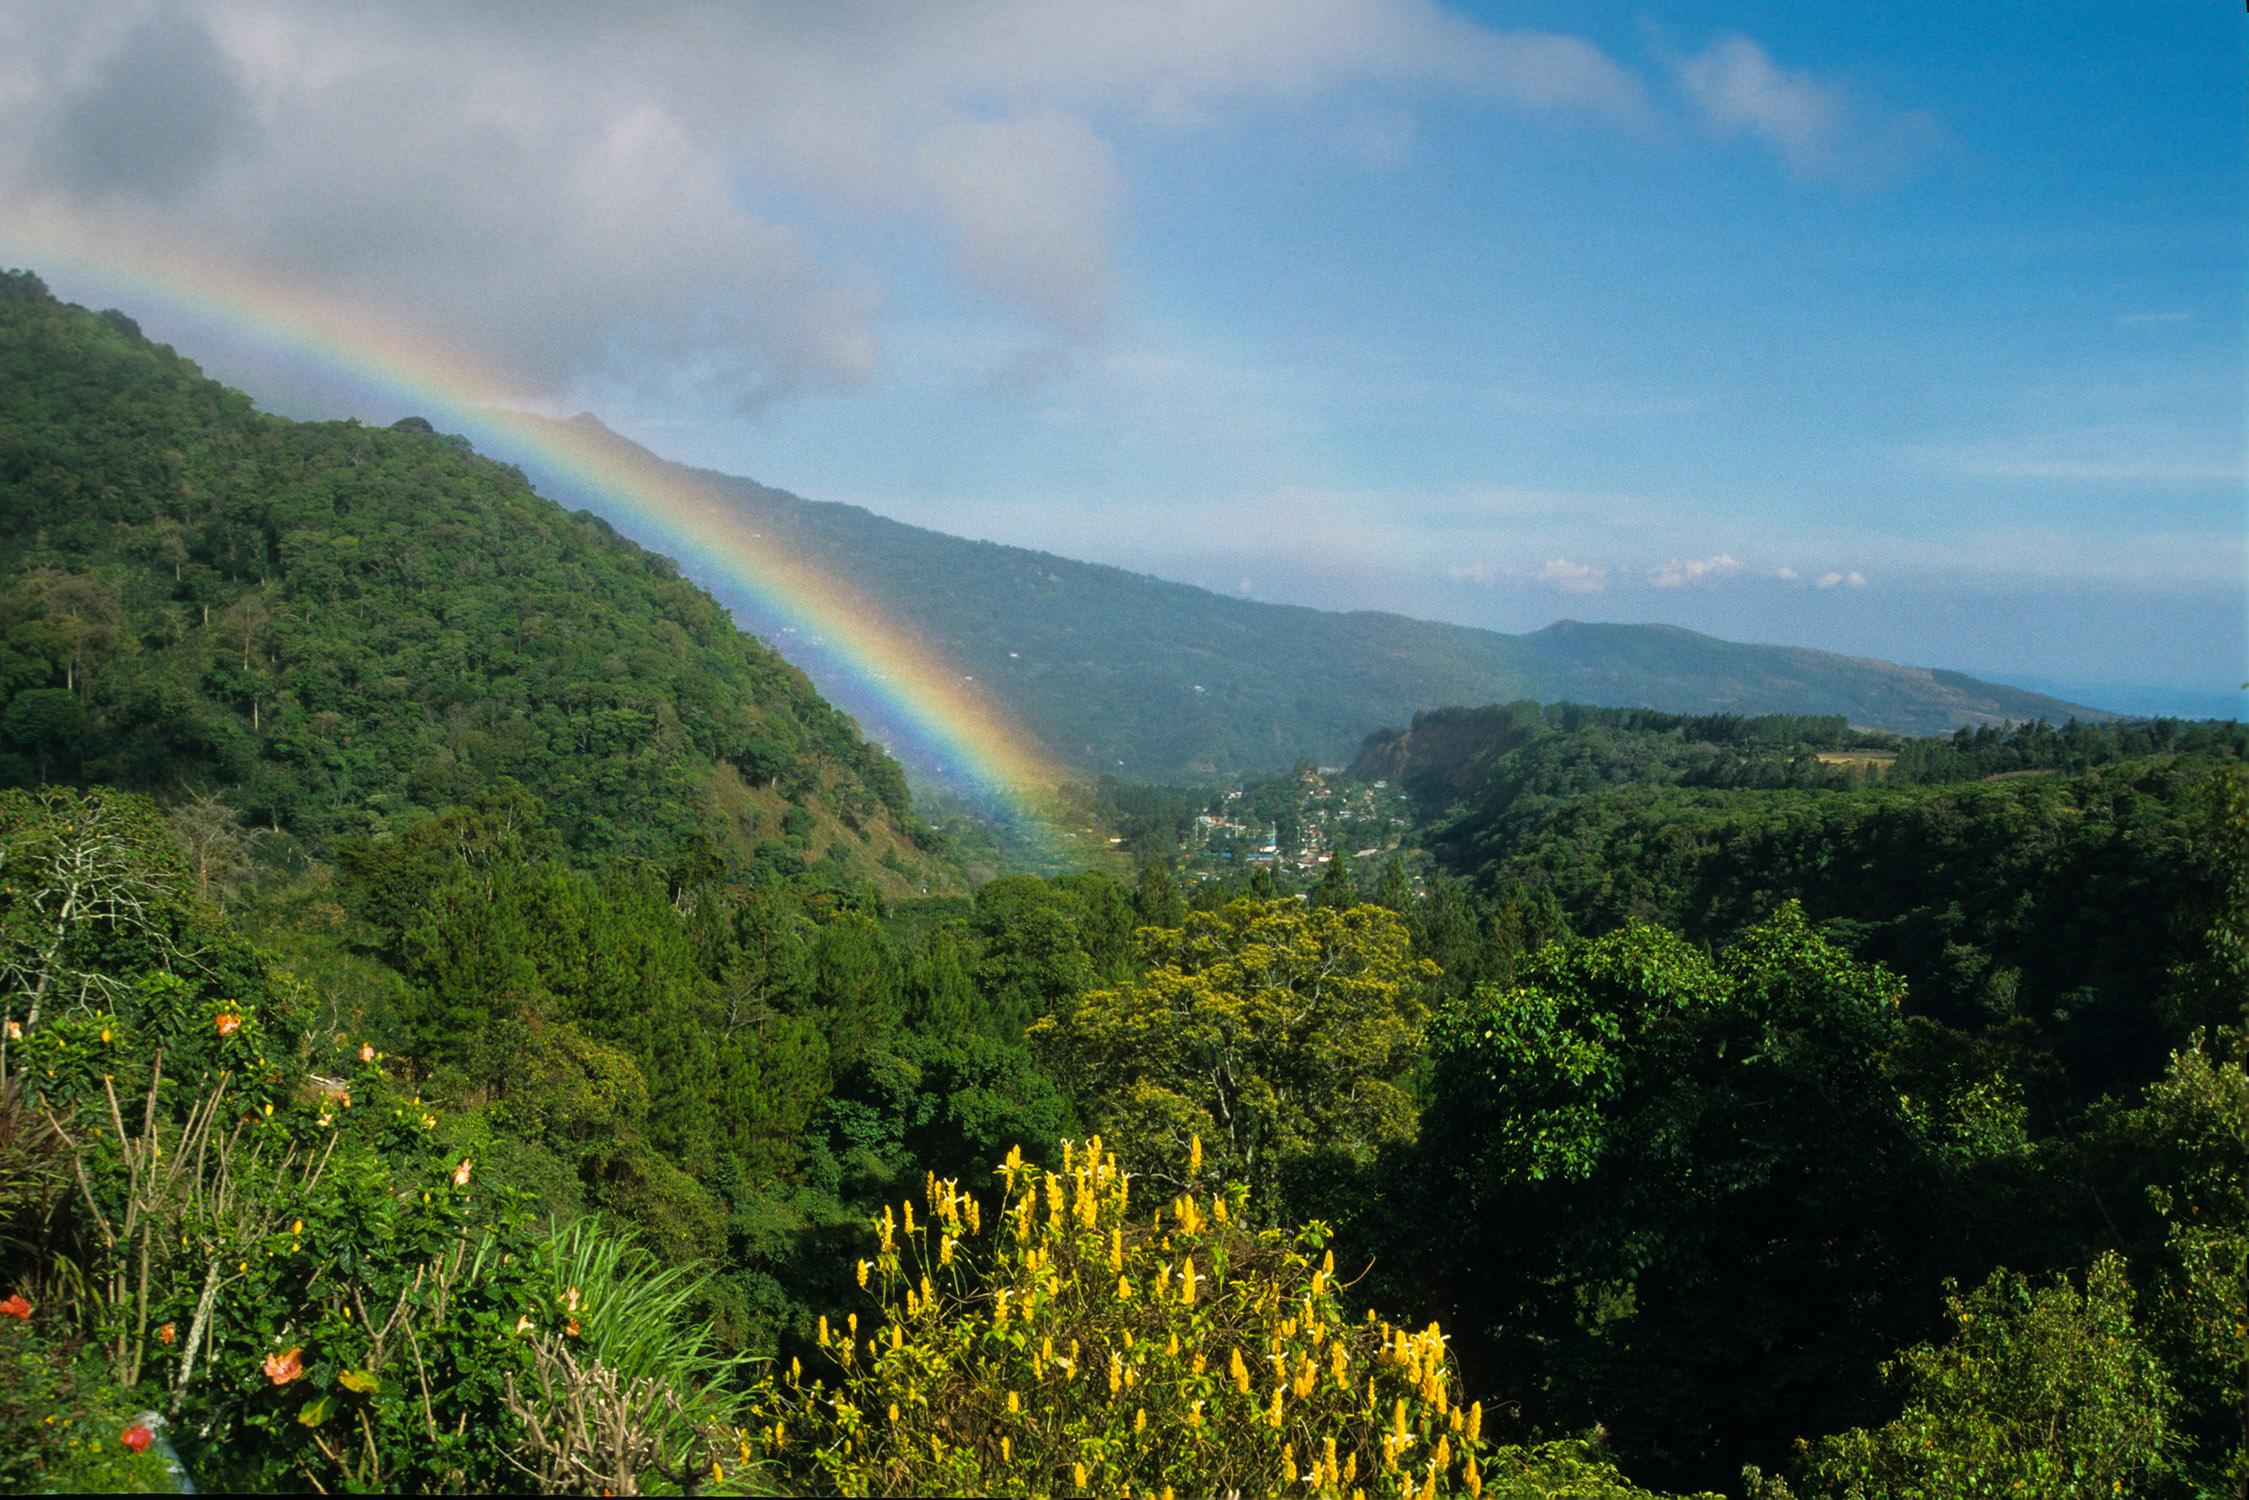 Rainbow over mountains